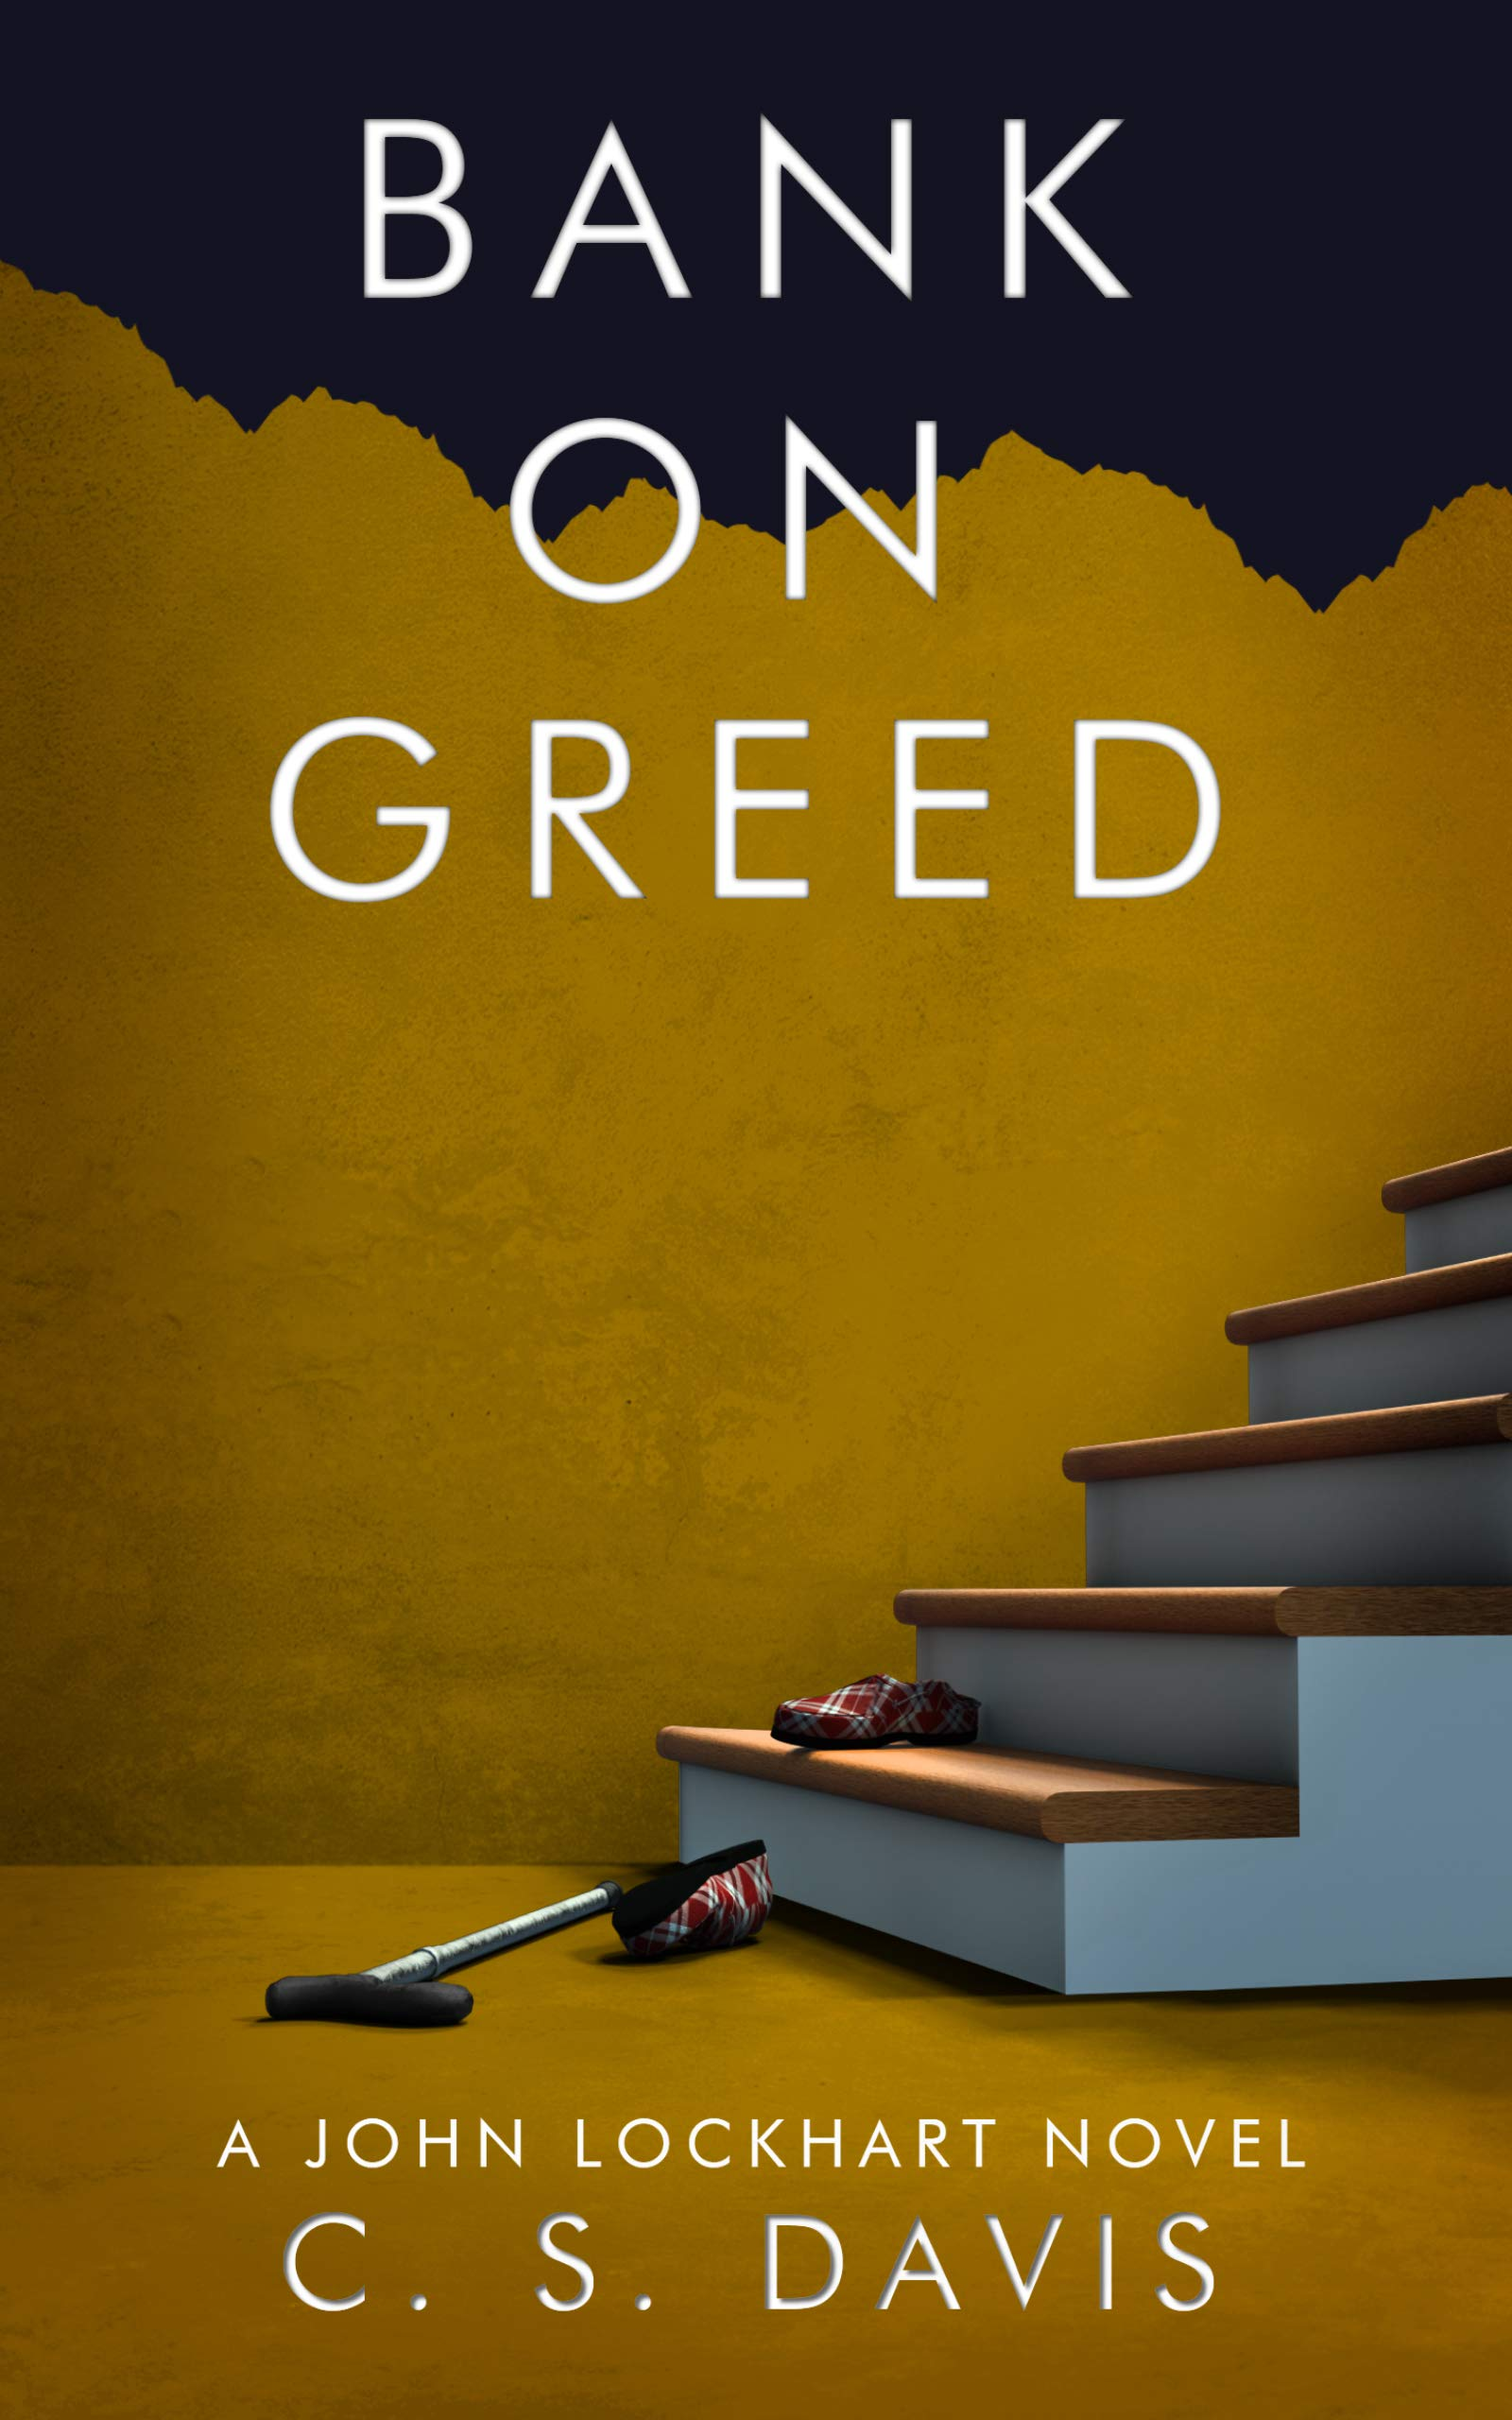 Bank on Greed (John Lockhart #2)